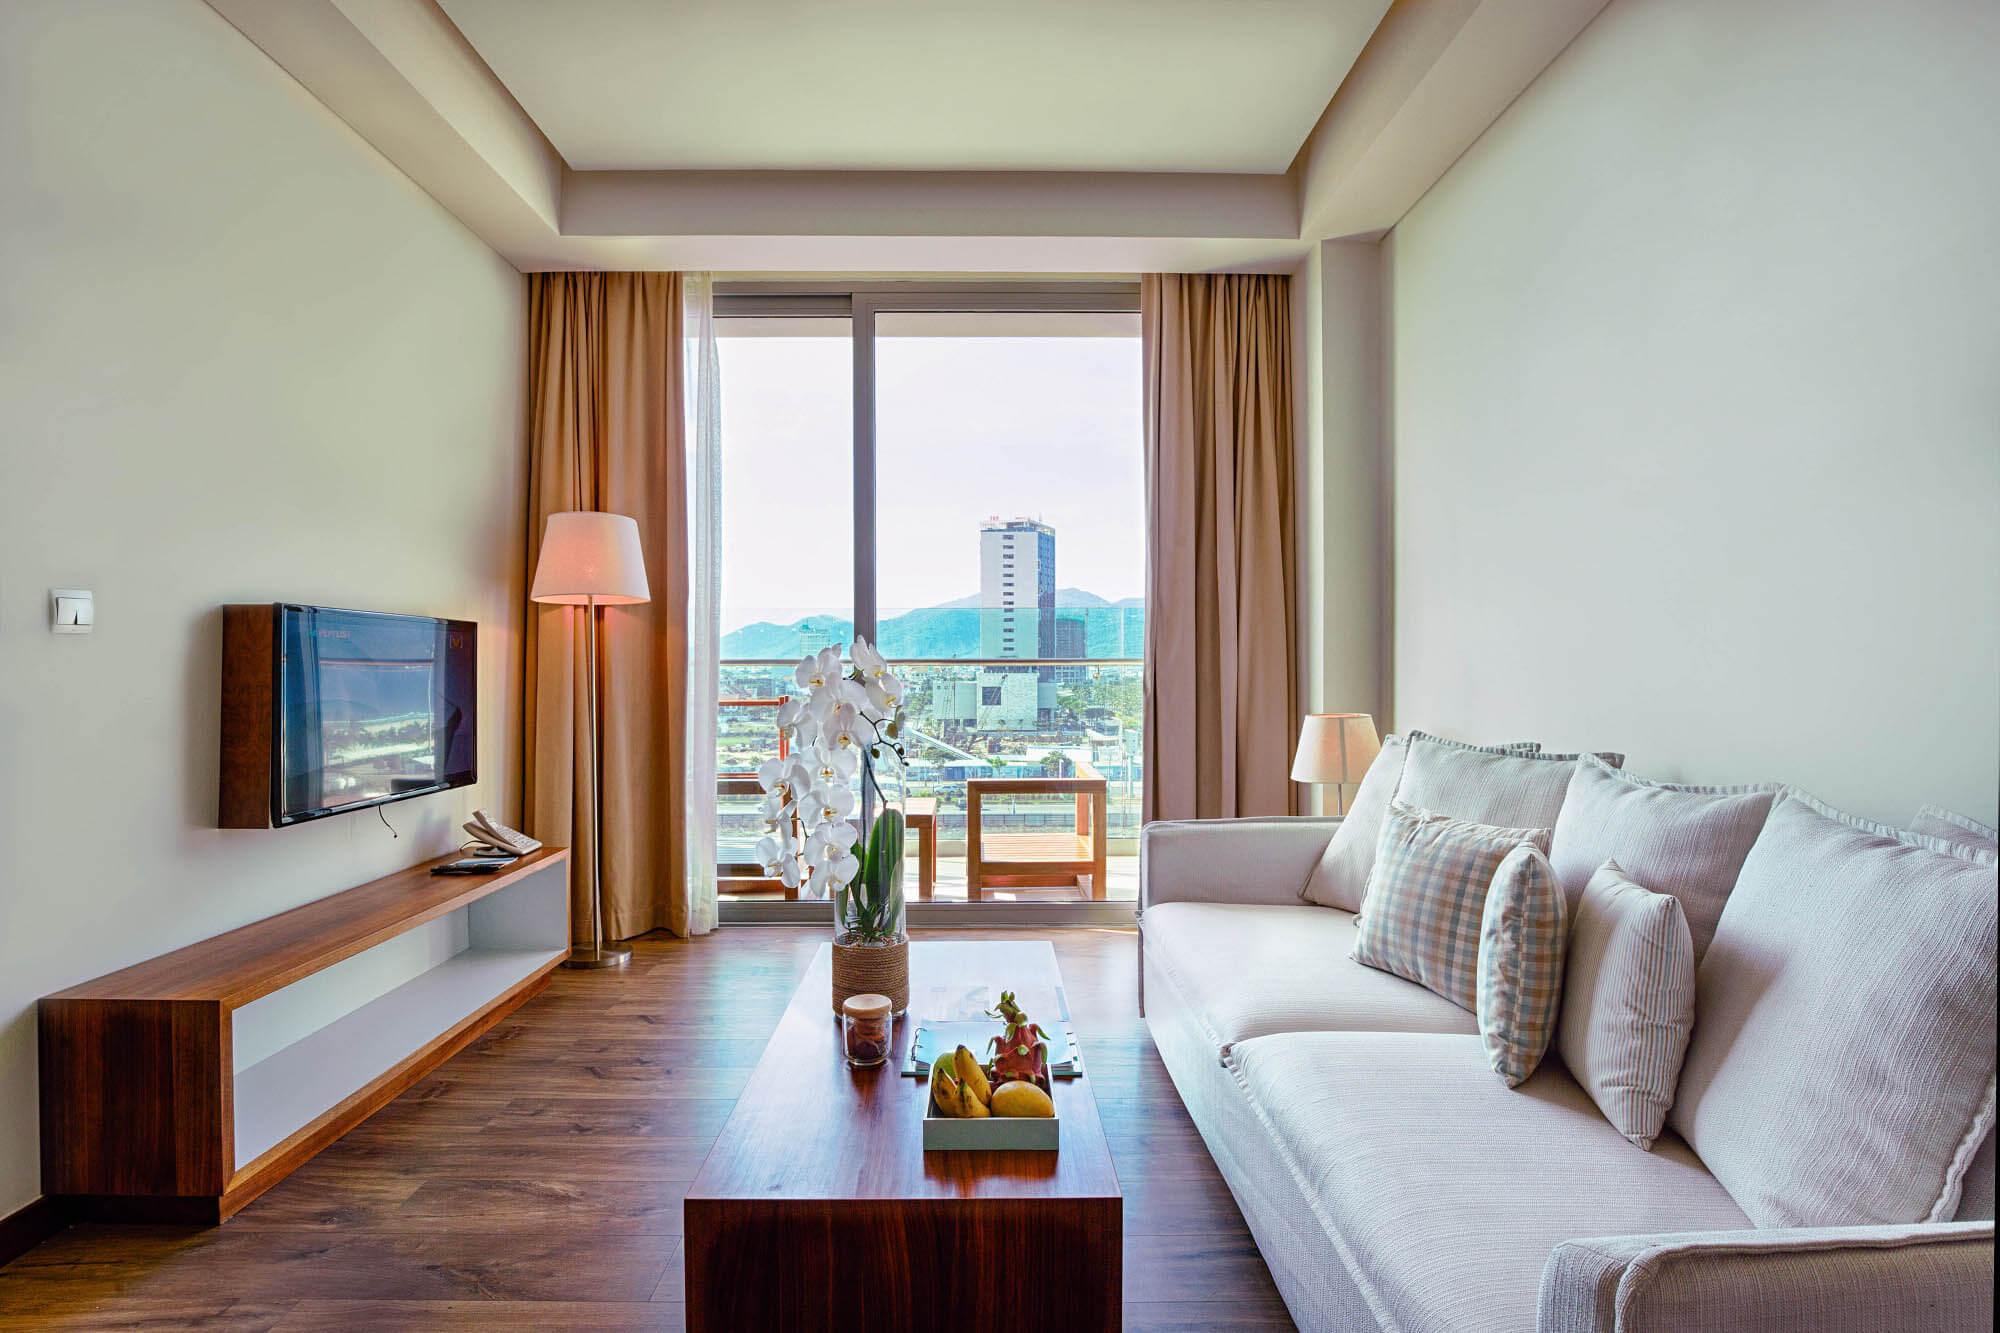 Delight Plus Apartment Apartment A La Carte Danang Beach Hotel 200 Vo Nguyen Giap Danang Fantasticity Com 01